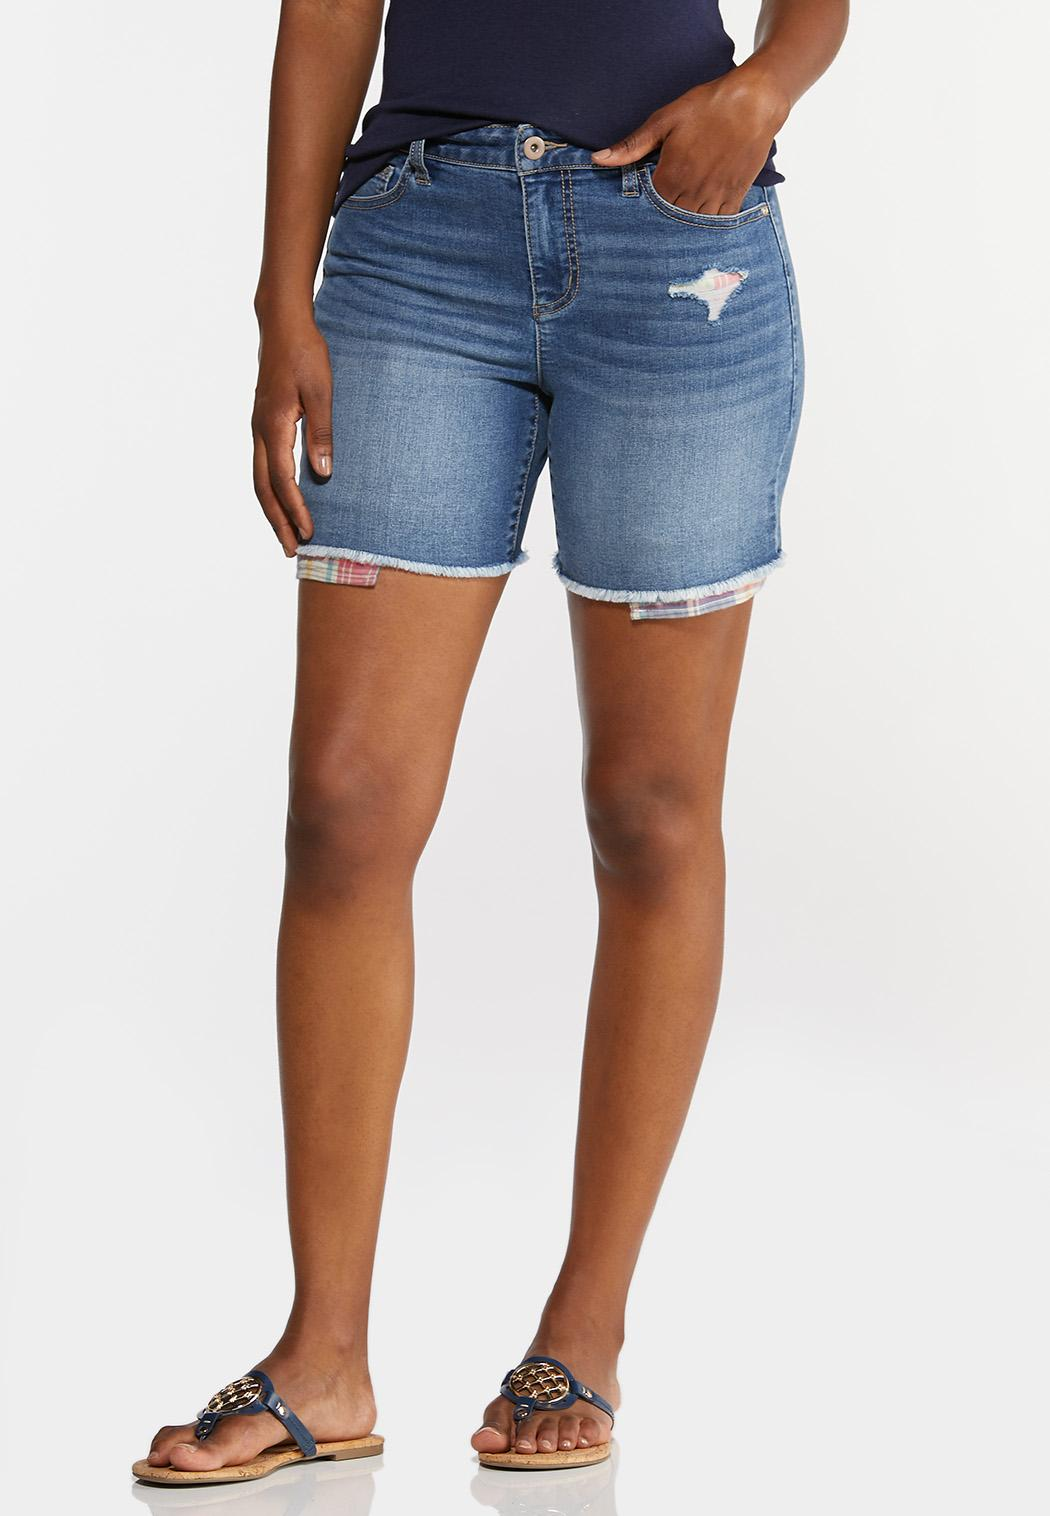 Peek-A-Boo Patchwork Denim Shorts